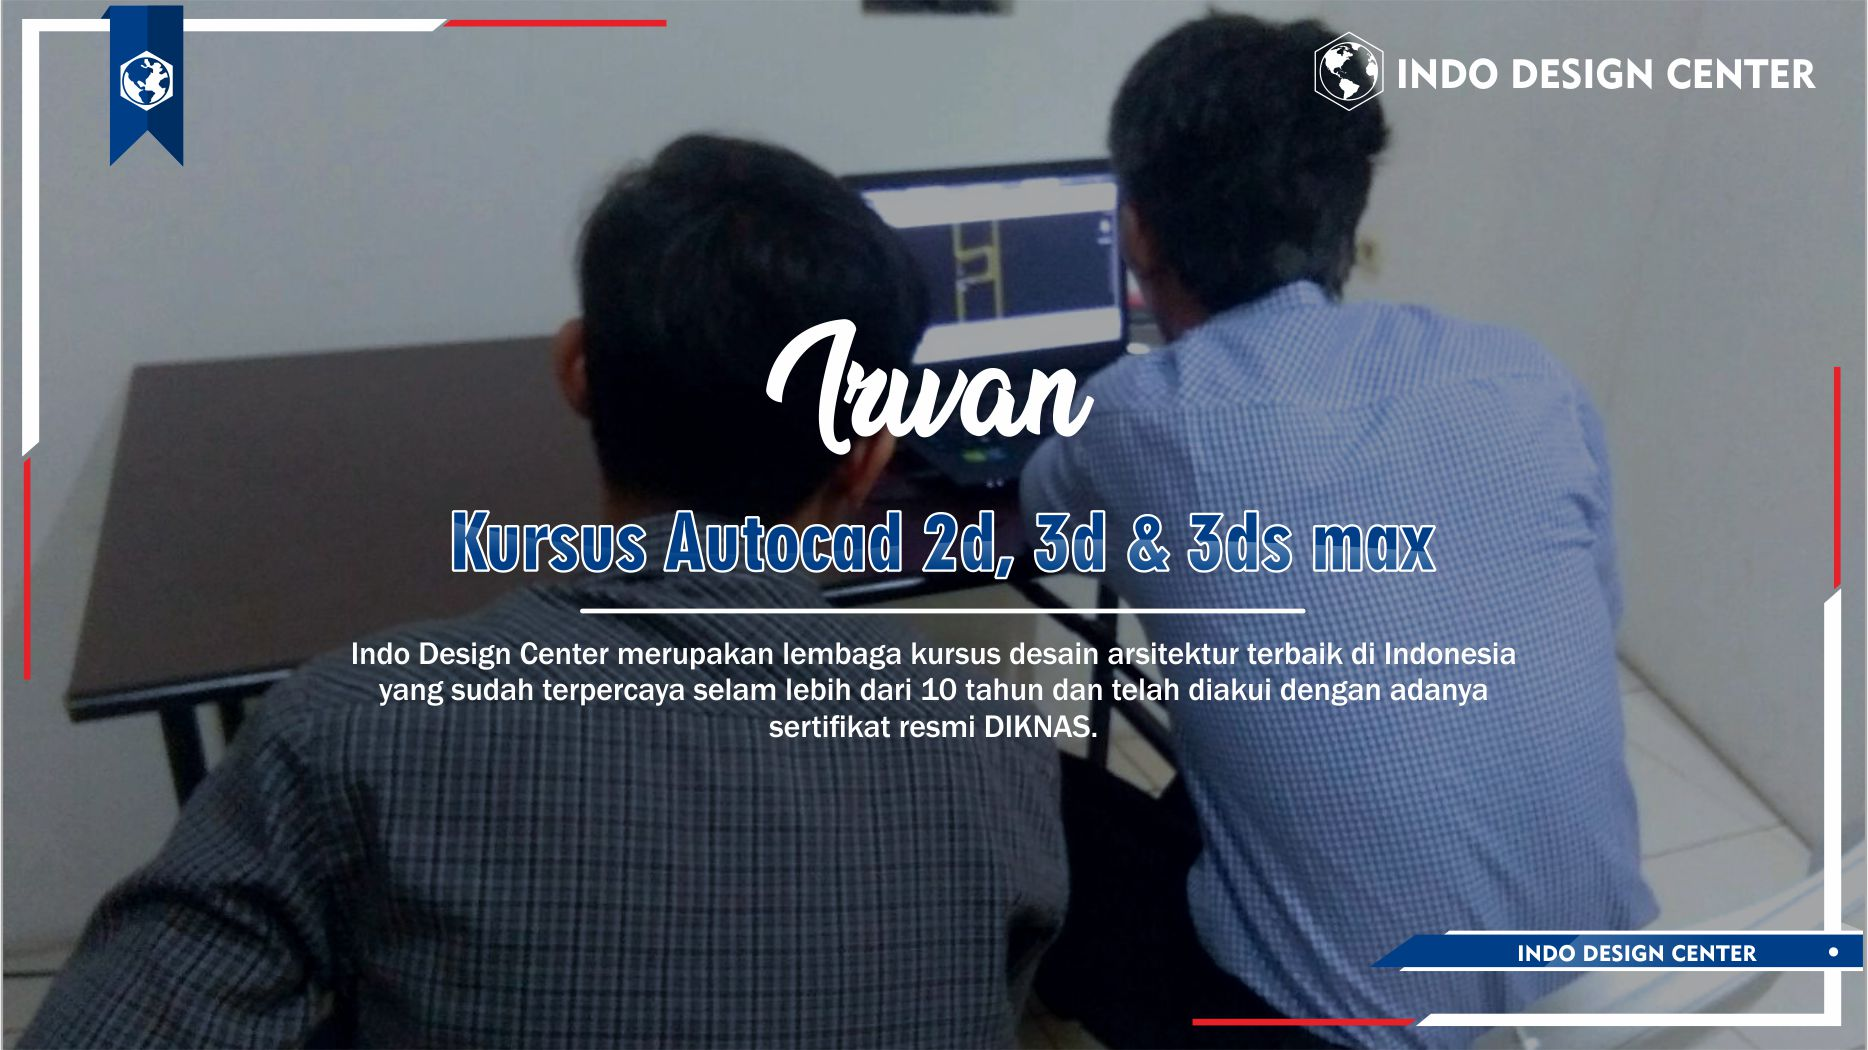 Kursus Autocad 2D, 3D & 3ds Max Jatiluwung Tangerang Irwan Setiawan